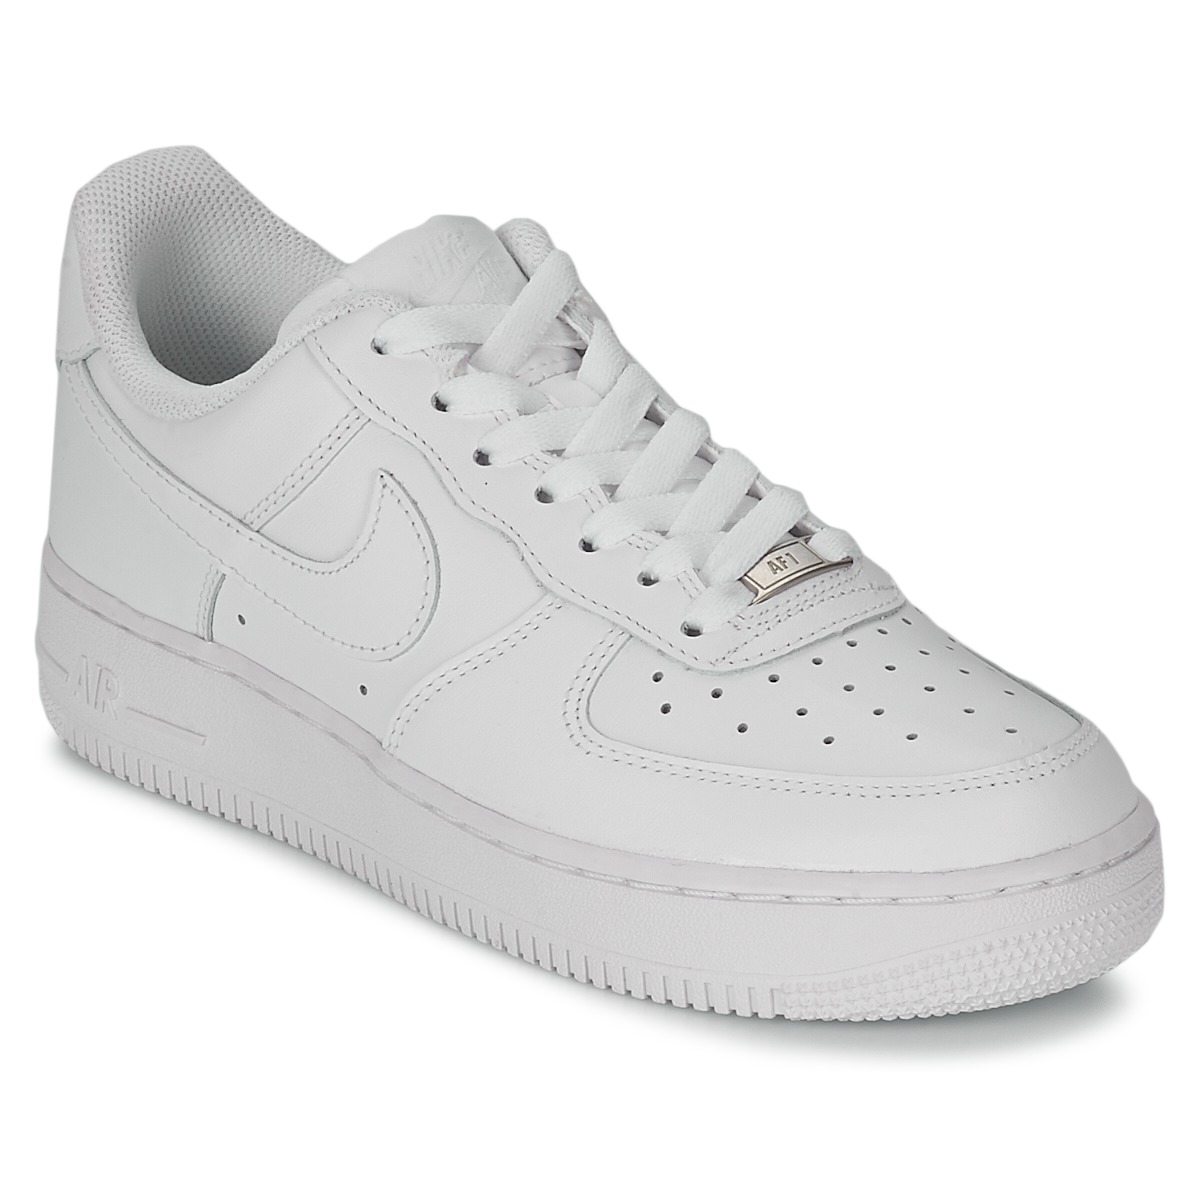 Nike AIR FORCE 1 07 LEATHER W Weiss - Kostenloser Versand bei Spartoode ! - Schuhe Sneaker Low Damen 89,99 €